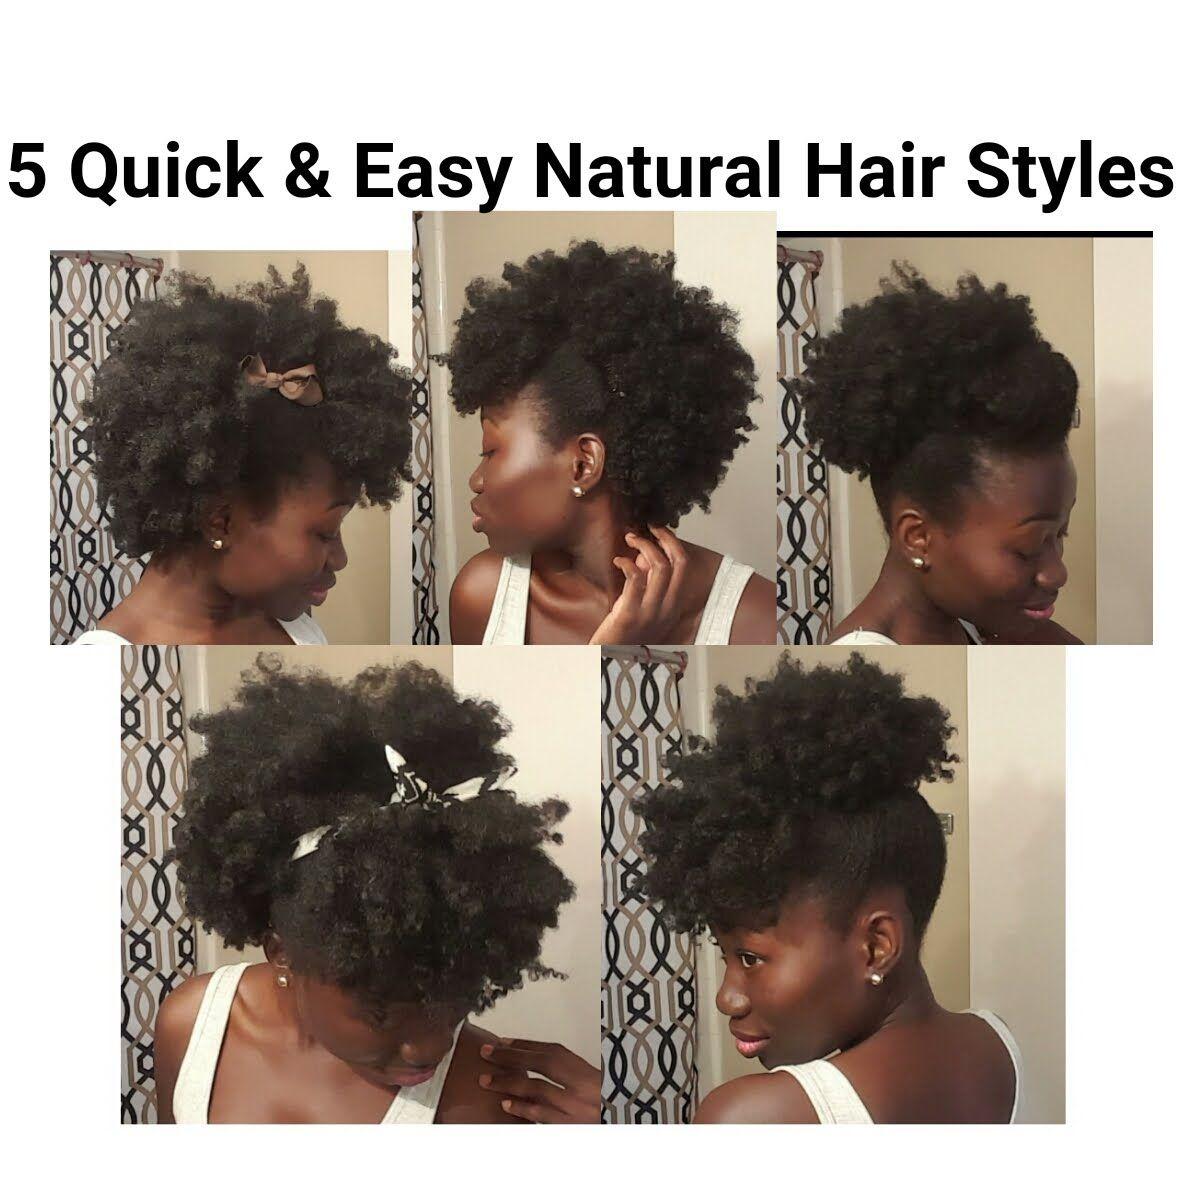 5 quick & easy natural hair styles. short/medium length